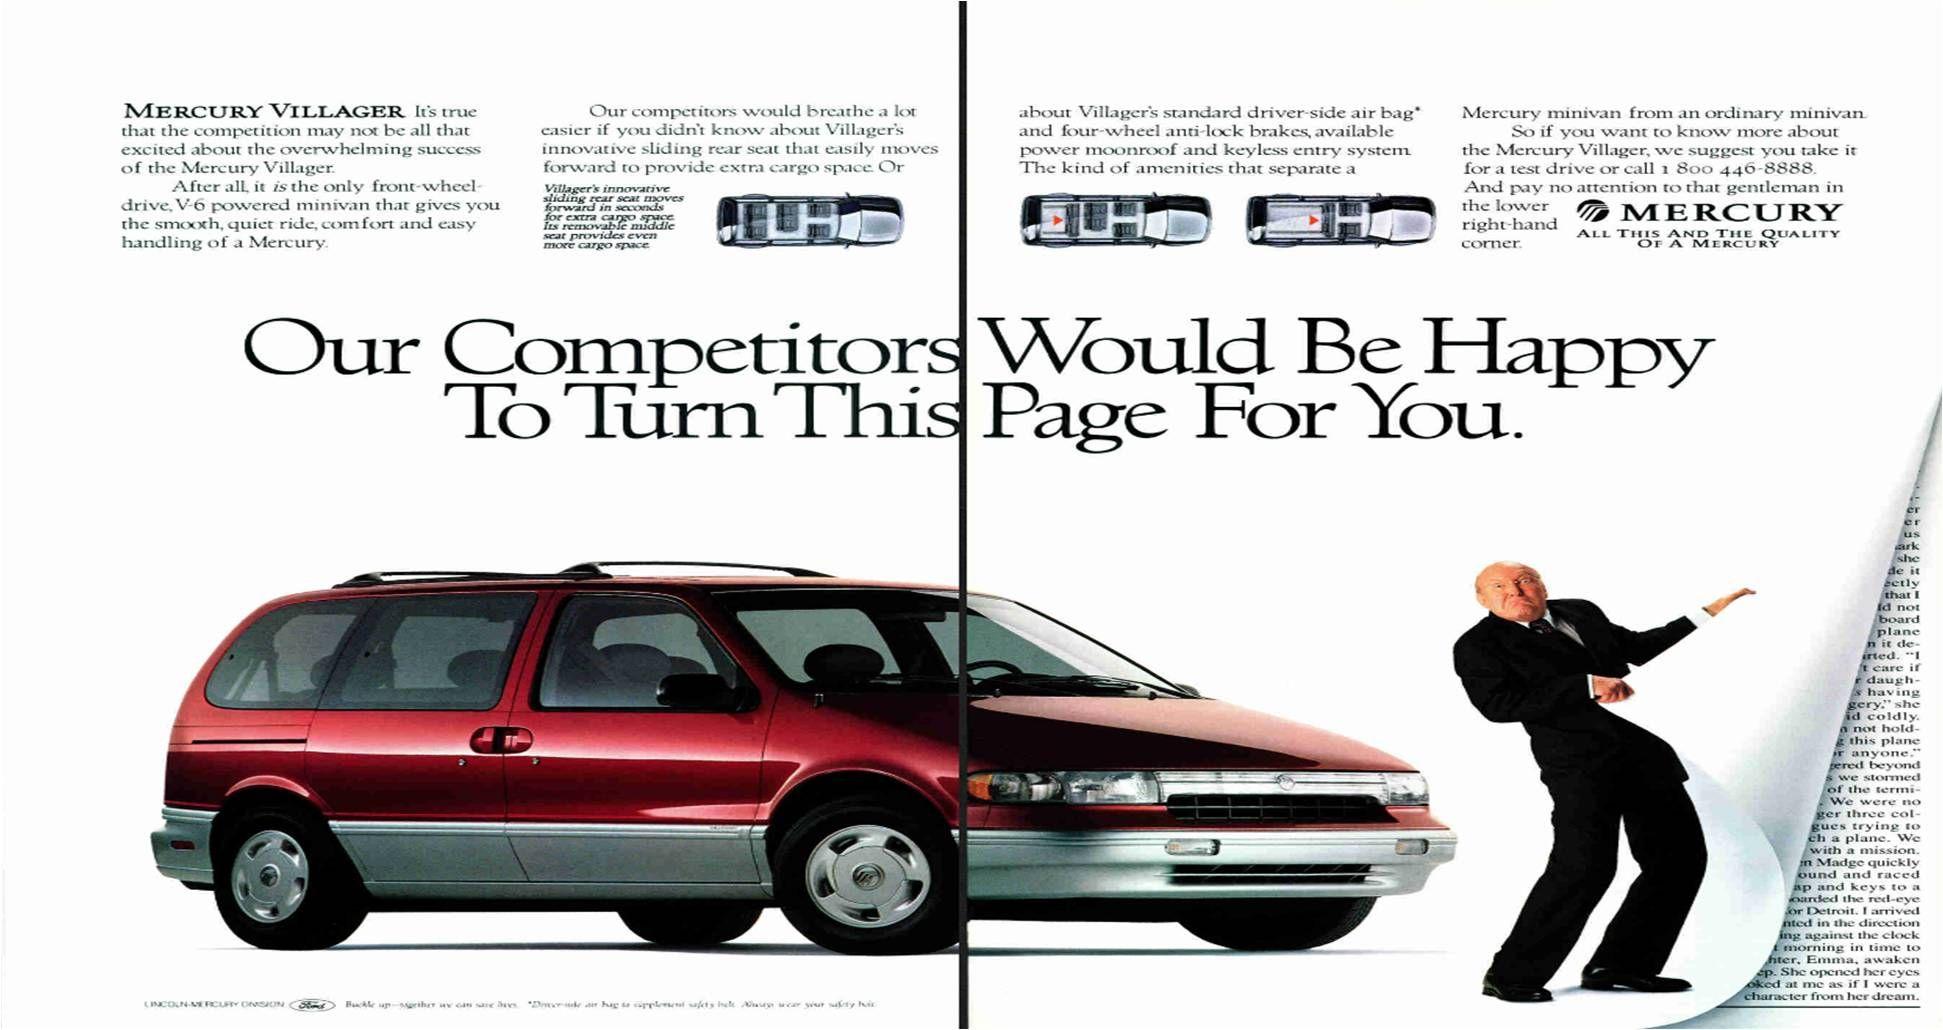 1994 Mercury Villager Ad Retro Cars Car Advertising Car Ads